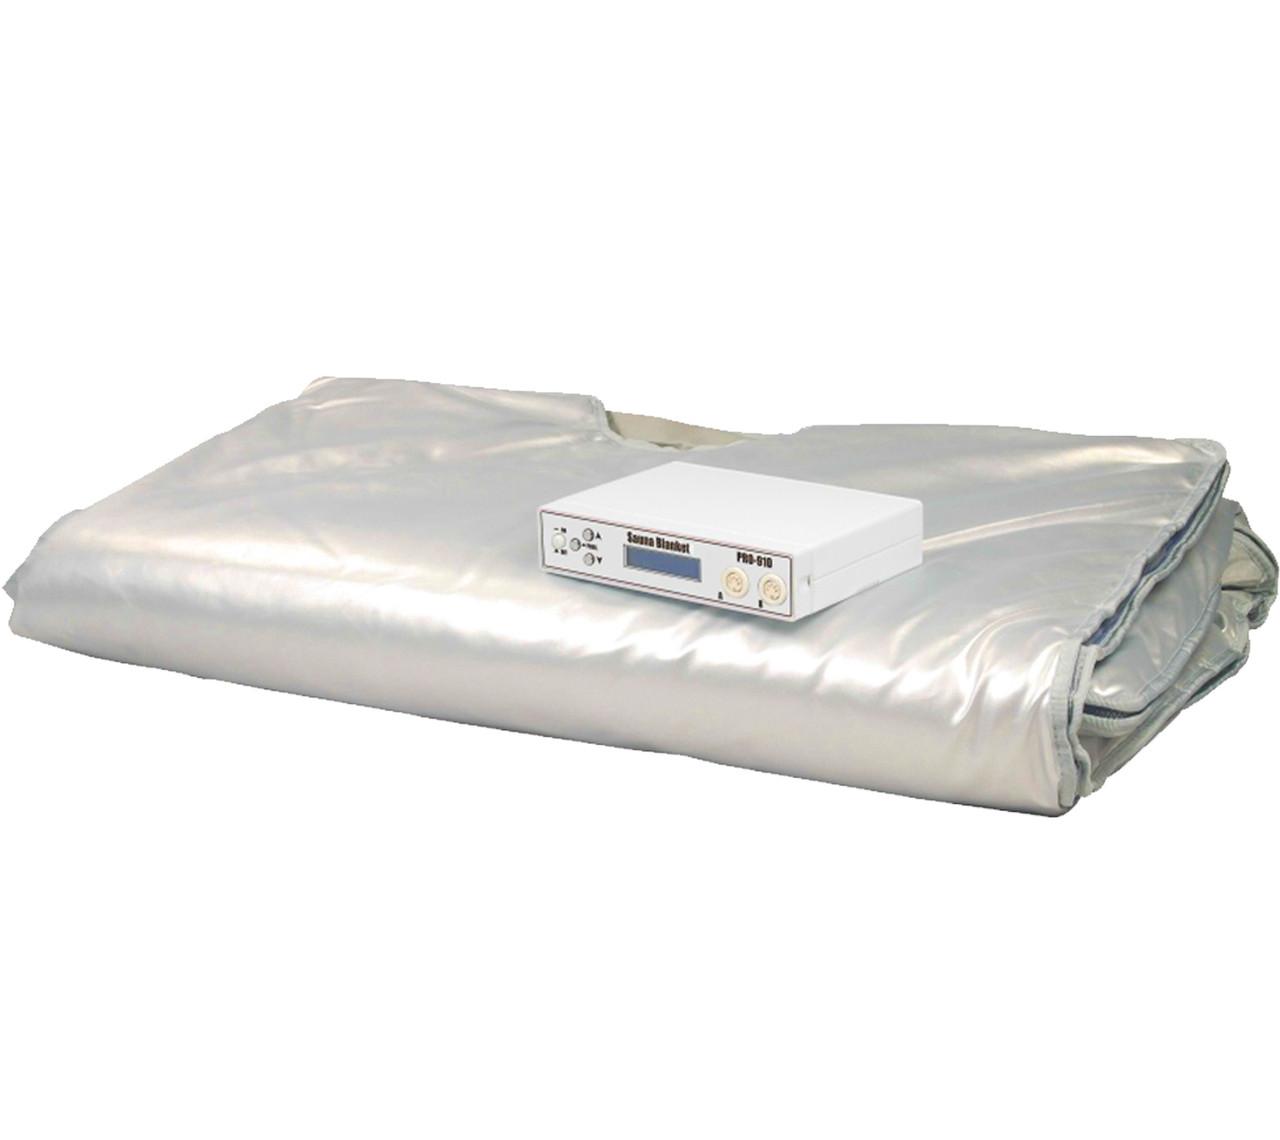 Eli 910 Digital Infrared Sauna Blanket